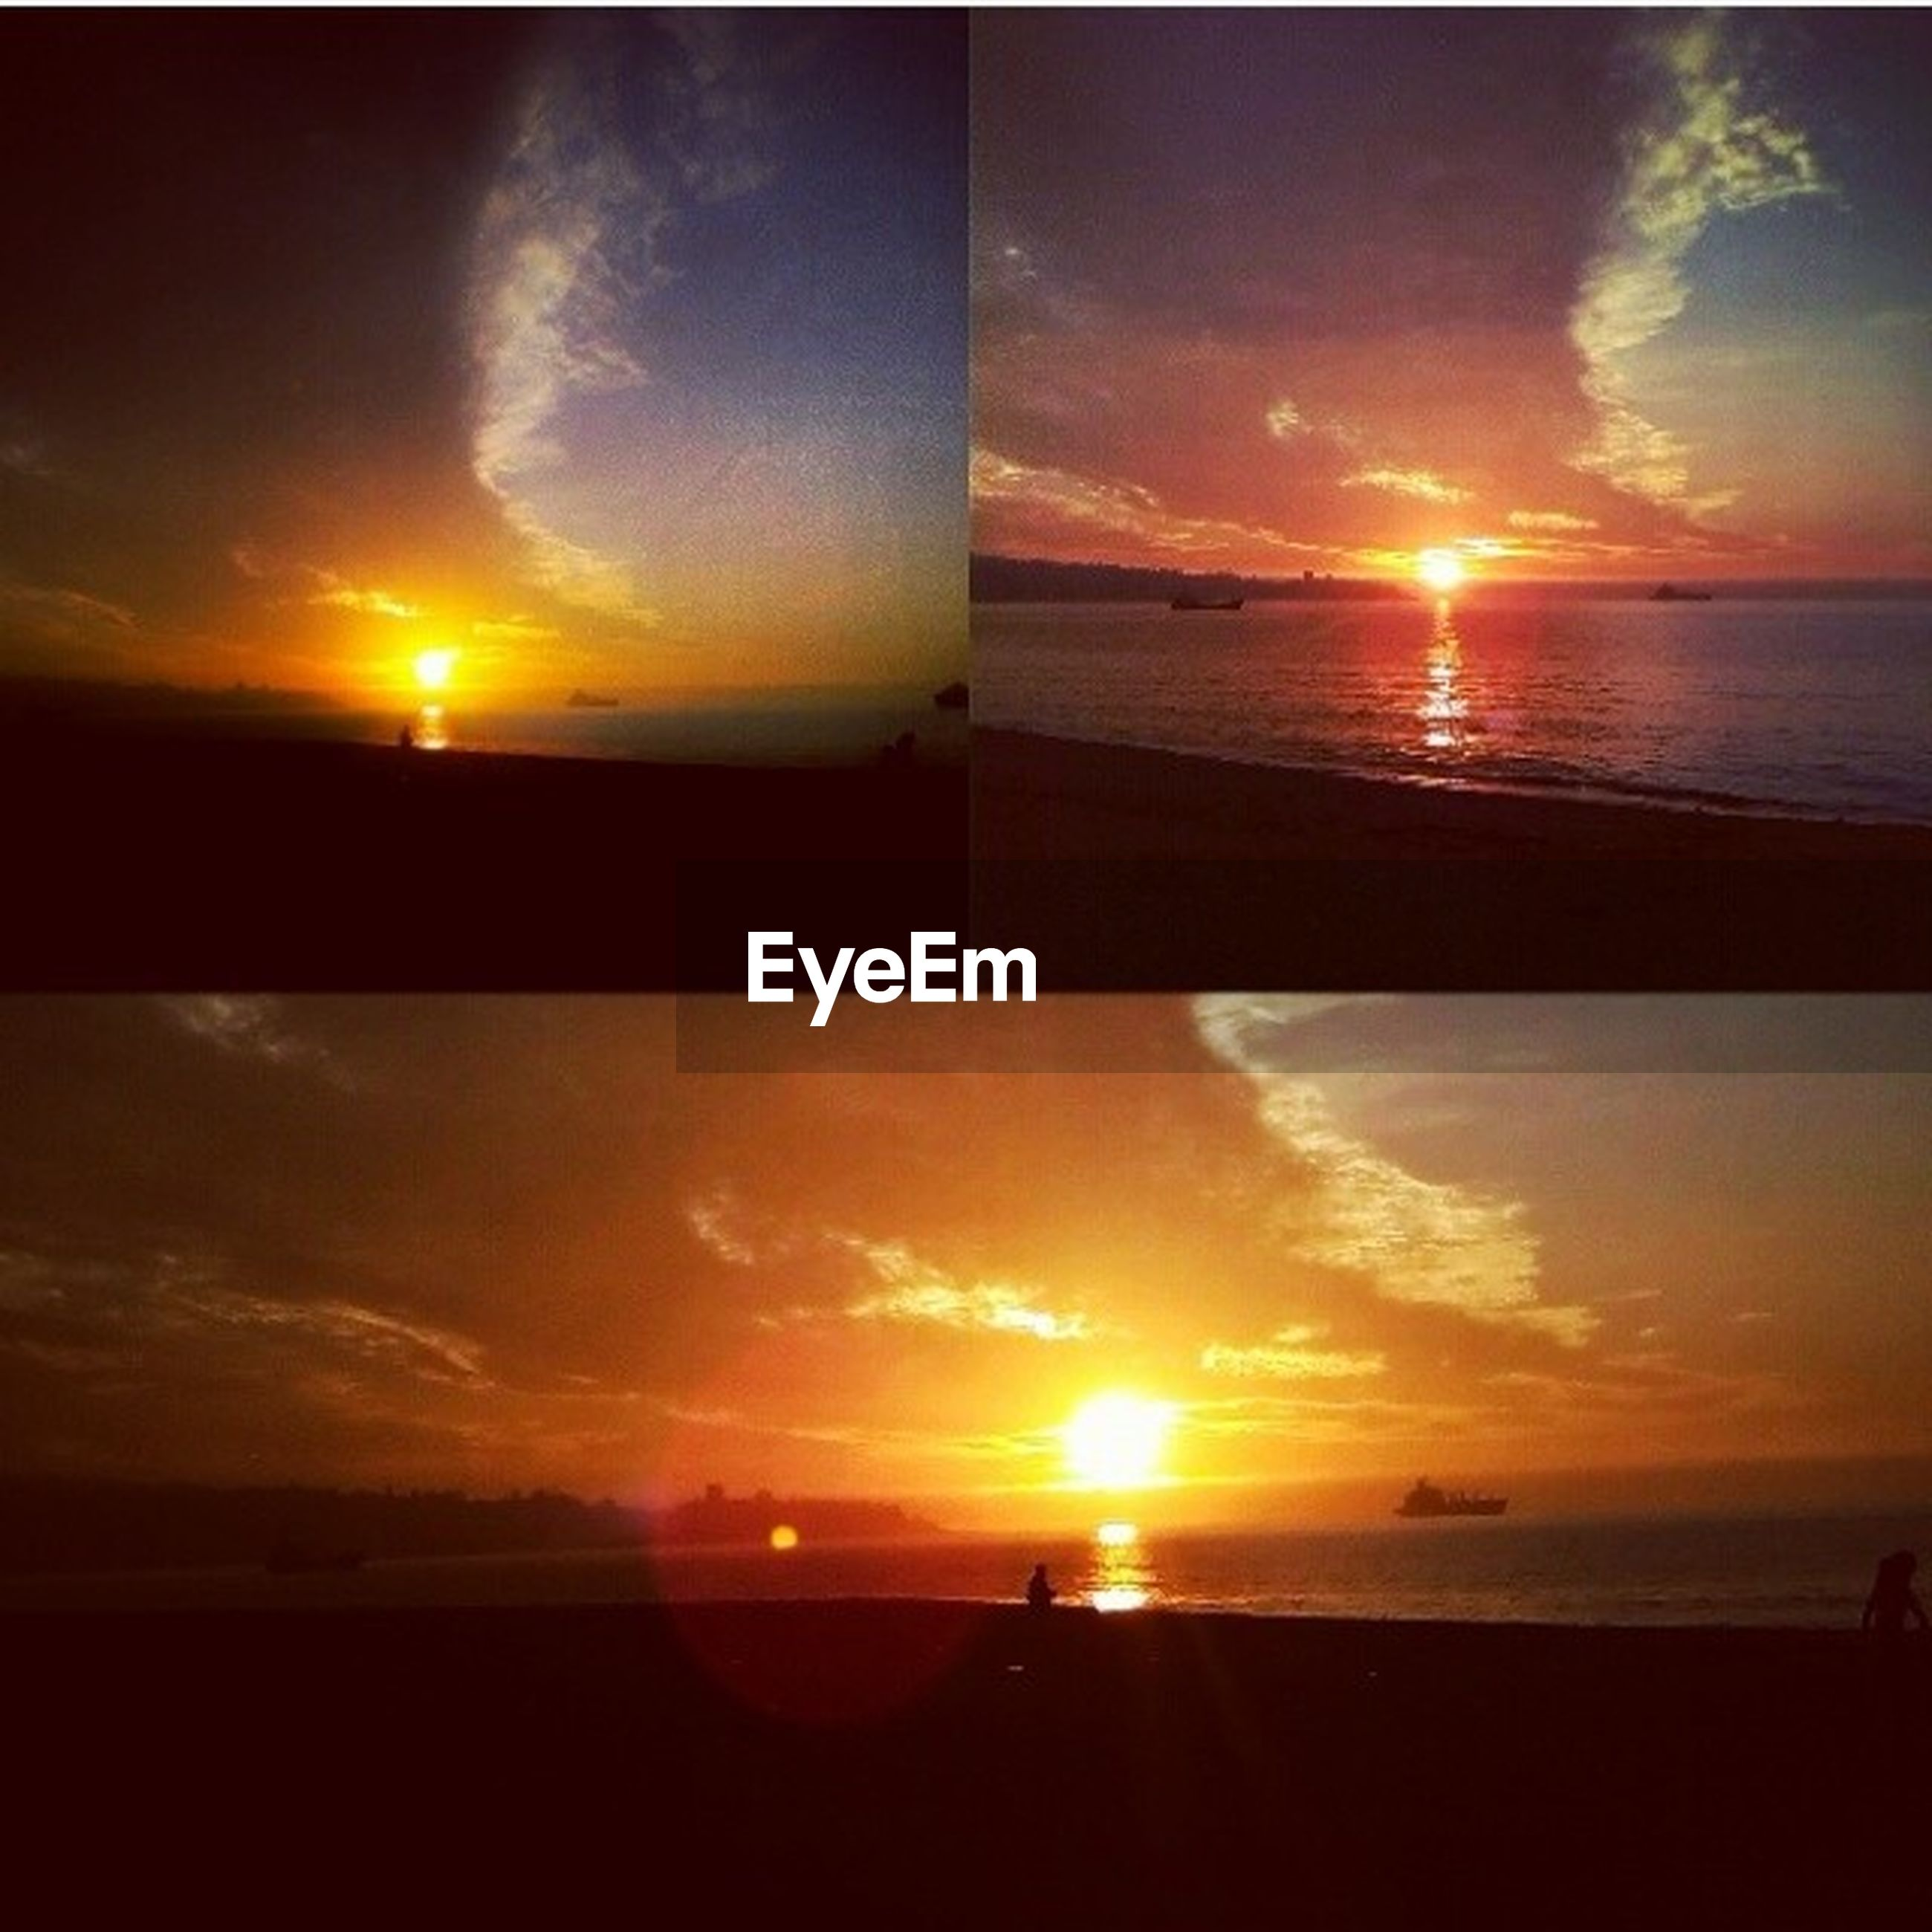 sunset, sun, sea, horizon over water, orange color, scenics, sky, water, beauty in nature, tranquil scene, beach, sunbeam, tranquility, sunlight, reflection, idyllic, silhouette, lens flare, nature, shore